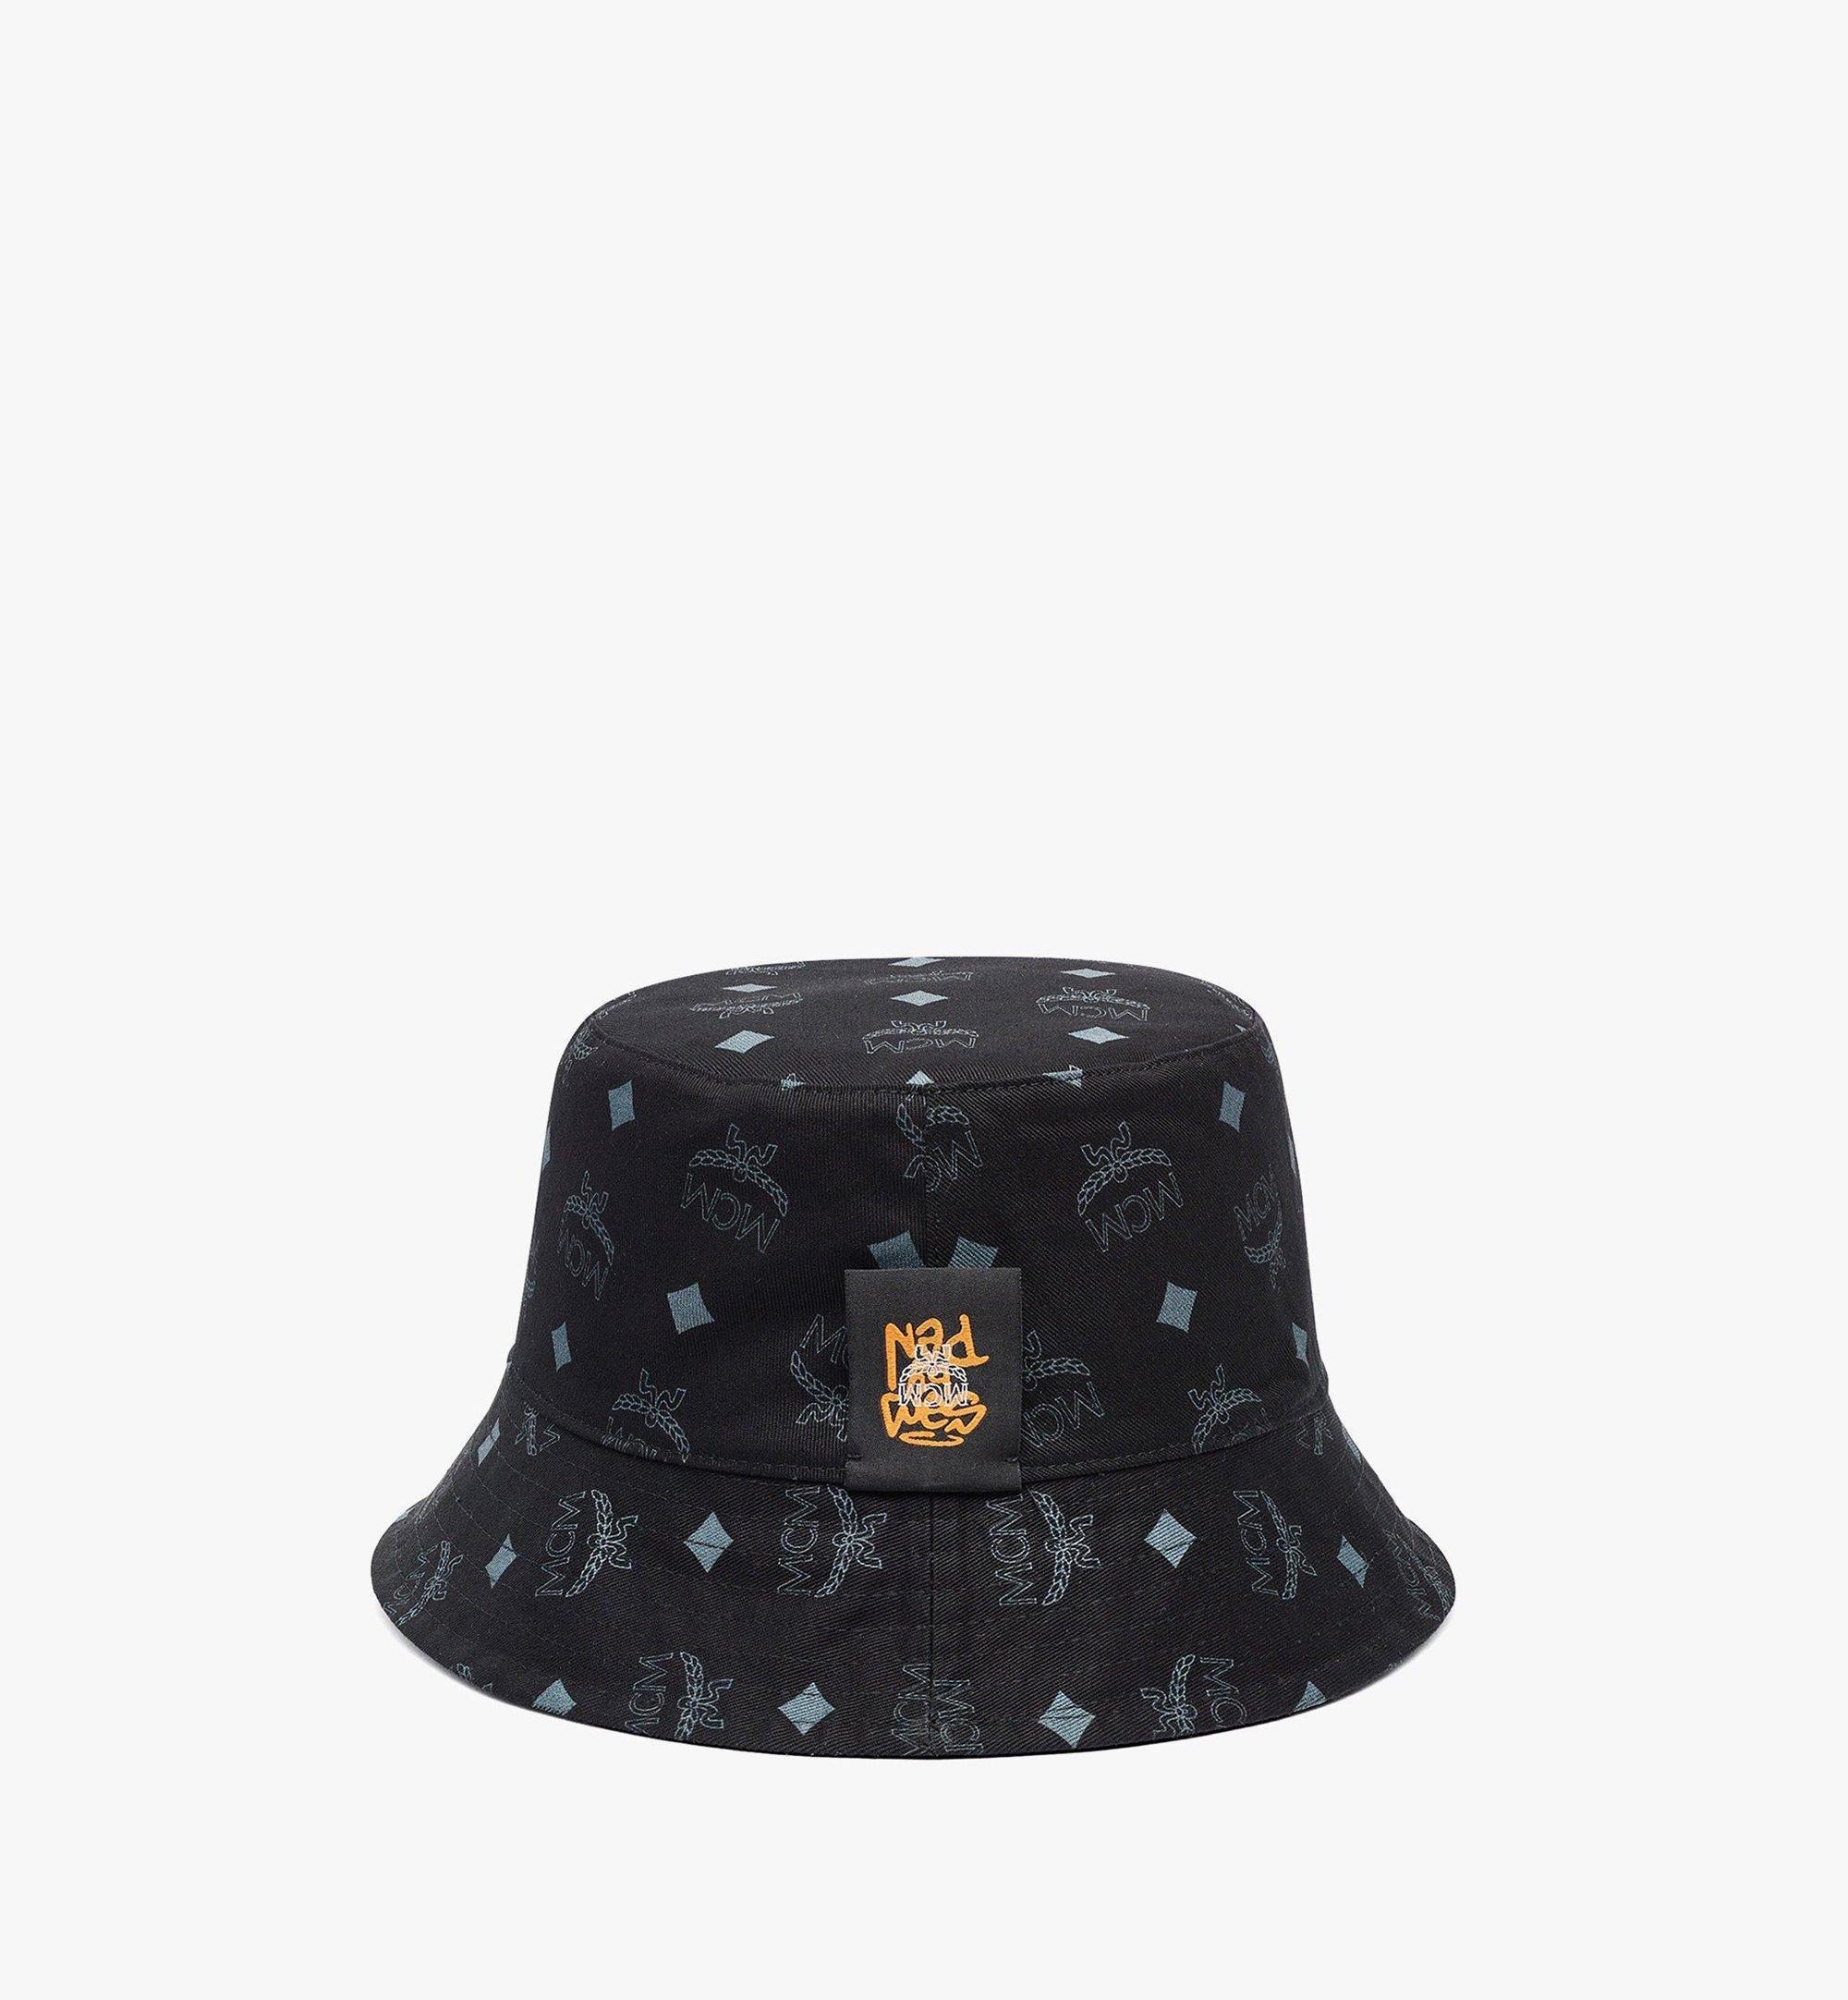 MCM MCM x SAMBYPEN Bucket Hat Black MEHBASP01BK001 Alternate View 3